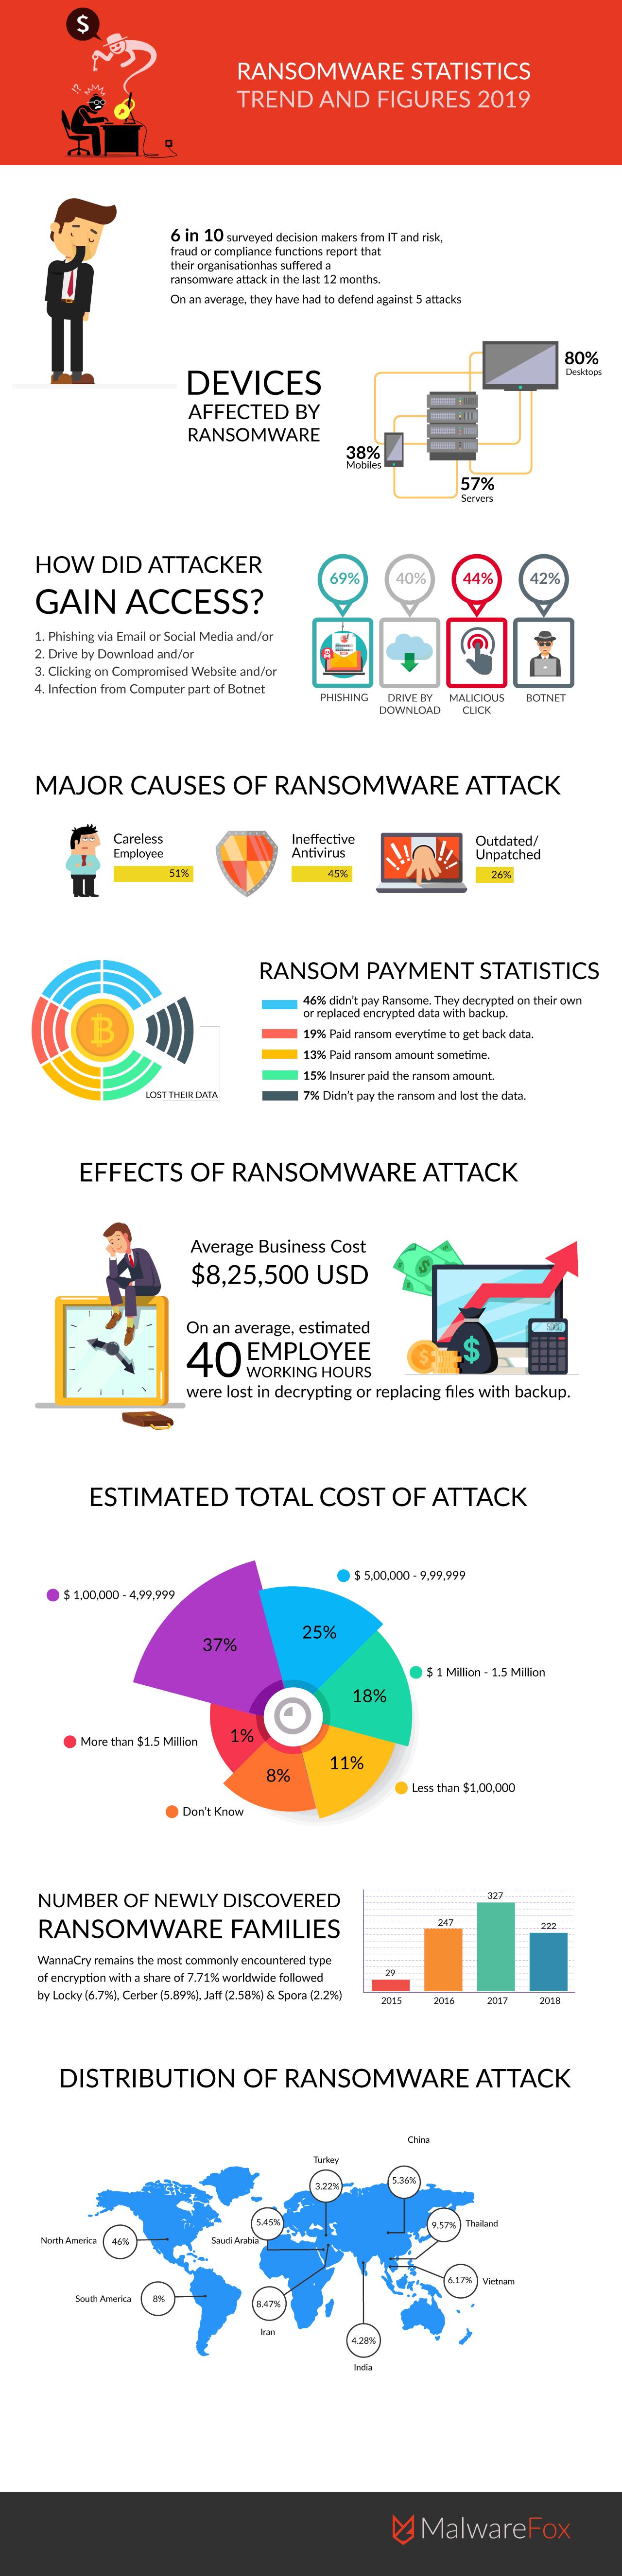 Ransomware Statistics 2019